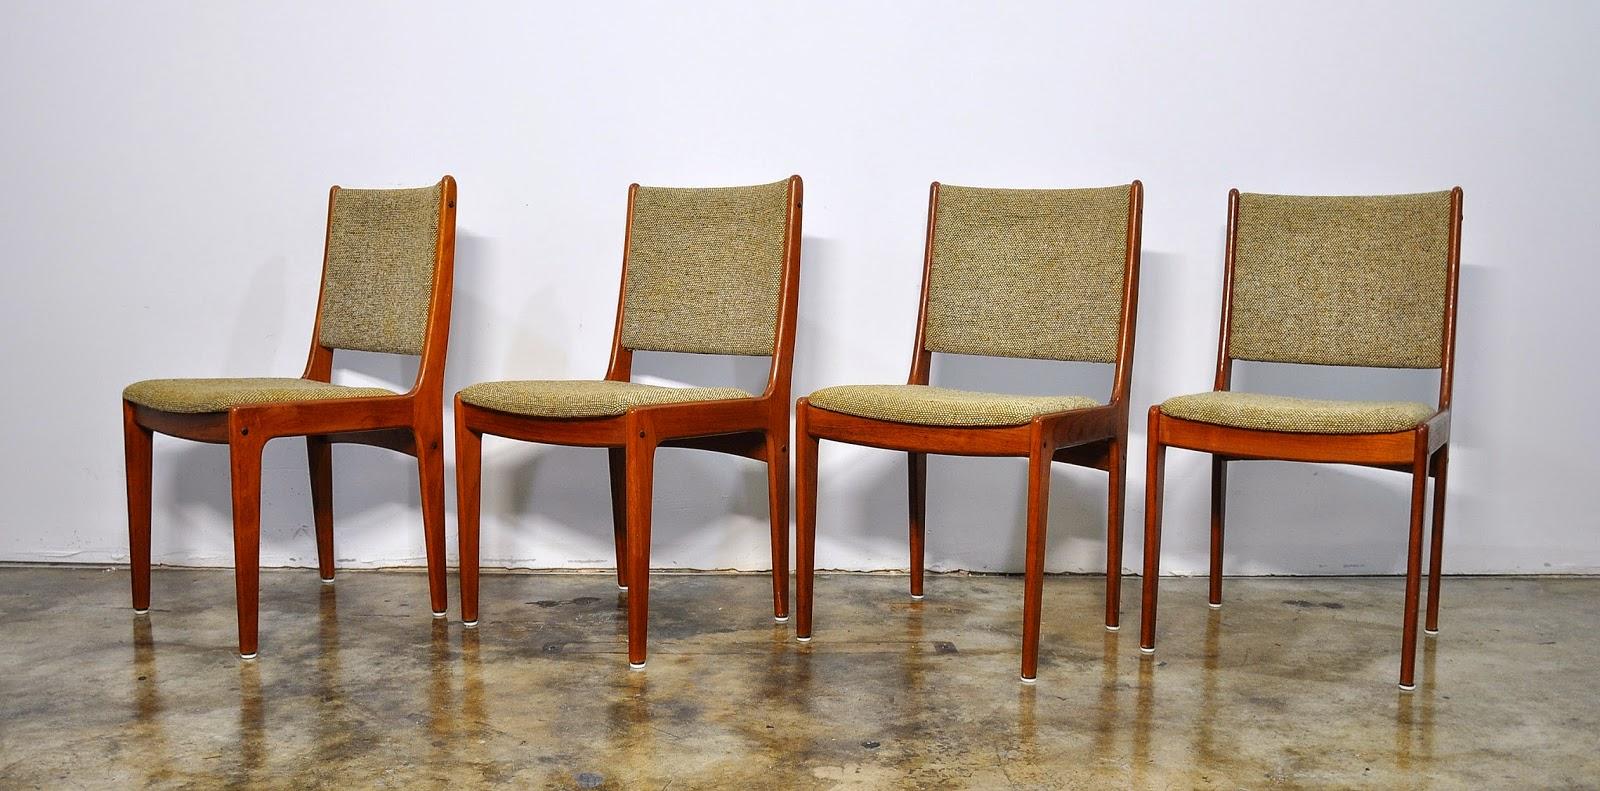 Select Modern Set Of 4 Danish Modern Teak Dining Chairs. Cedar Wood Walls. Ethan Allen Orlando. Palmer Construction. Ceramic Tile Backsplash. Spa Bathroom Decor. Metal Ottoman. Hammered Cabinet Pulls. Beach Artwork